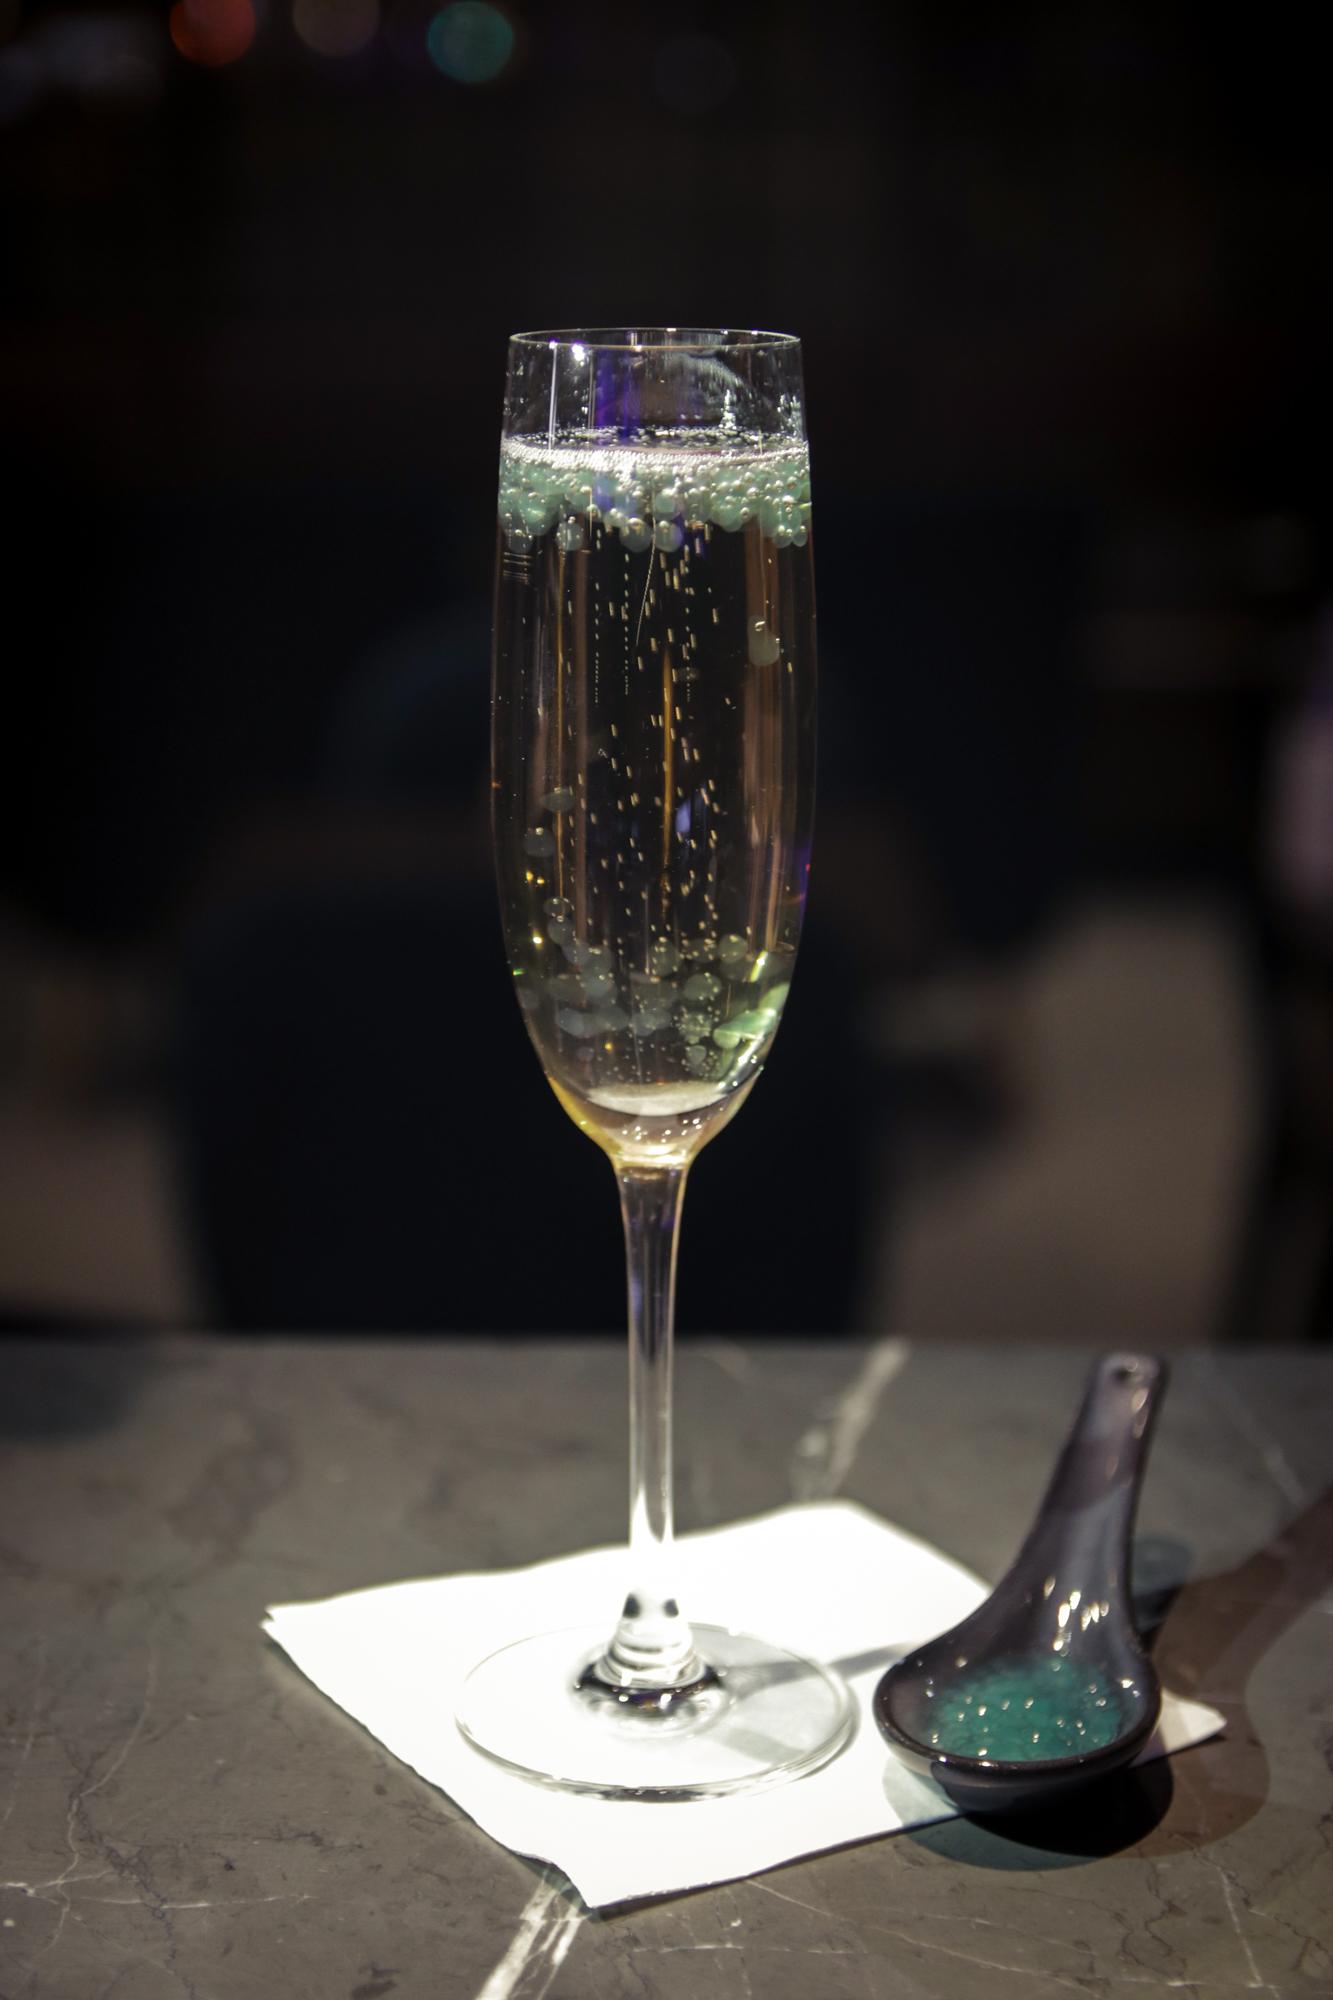 The futuristic Ziggy Starman cocktail from Social Wine Bar